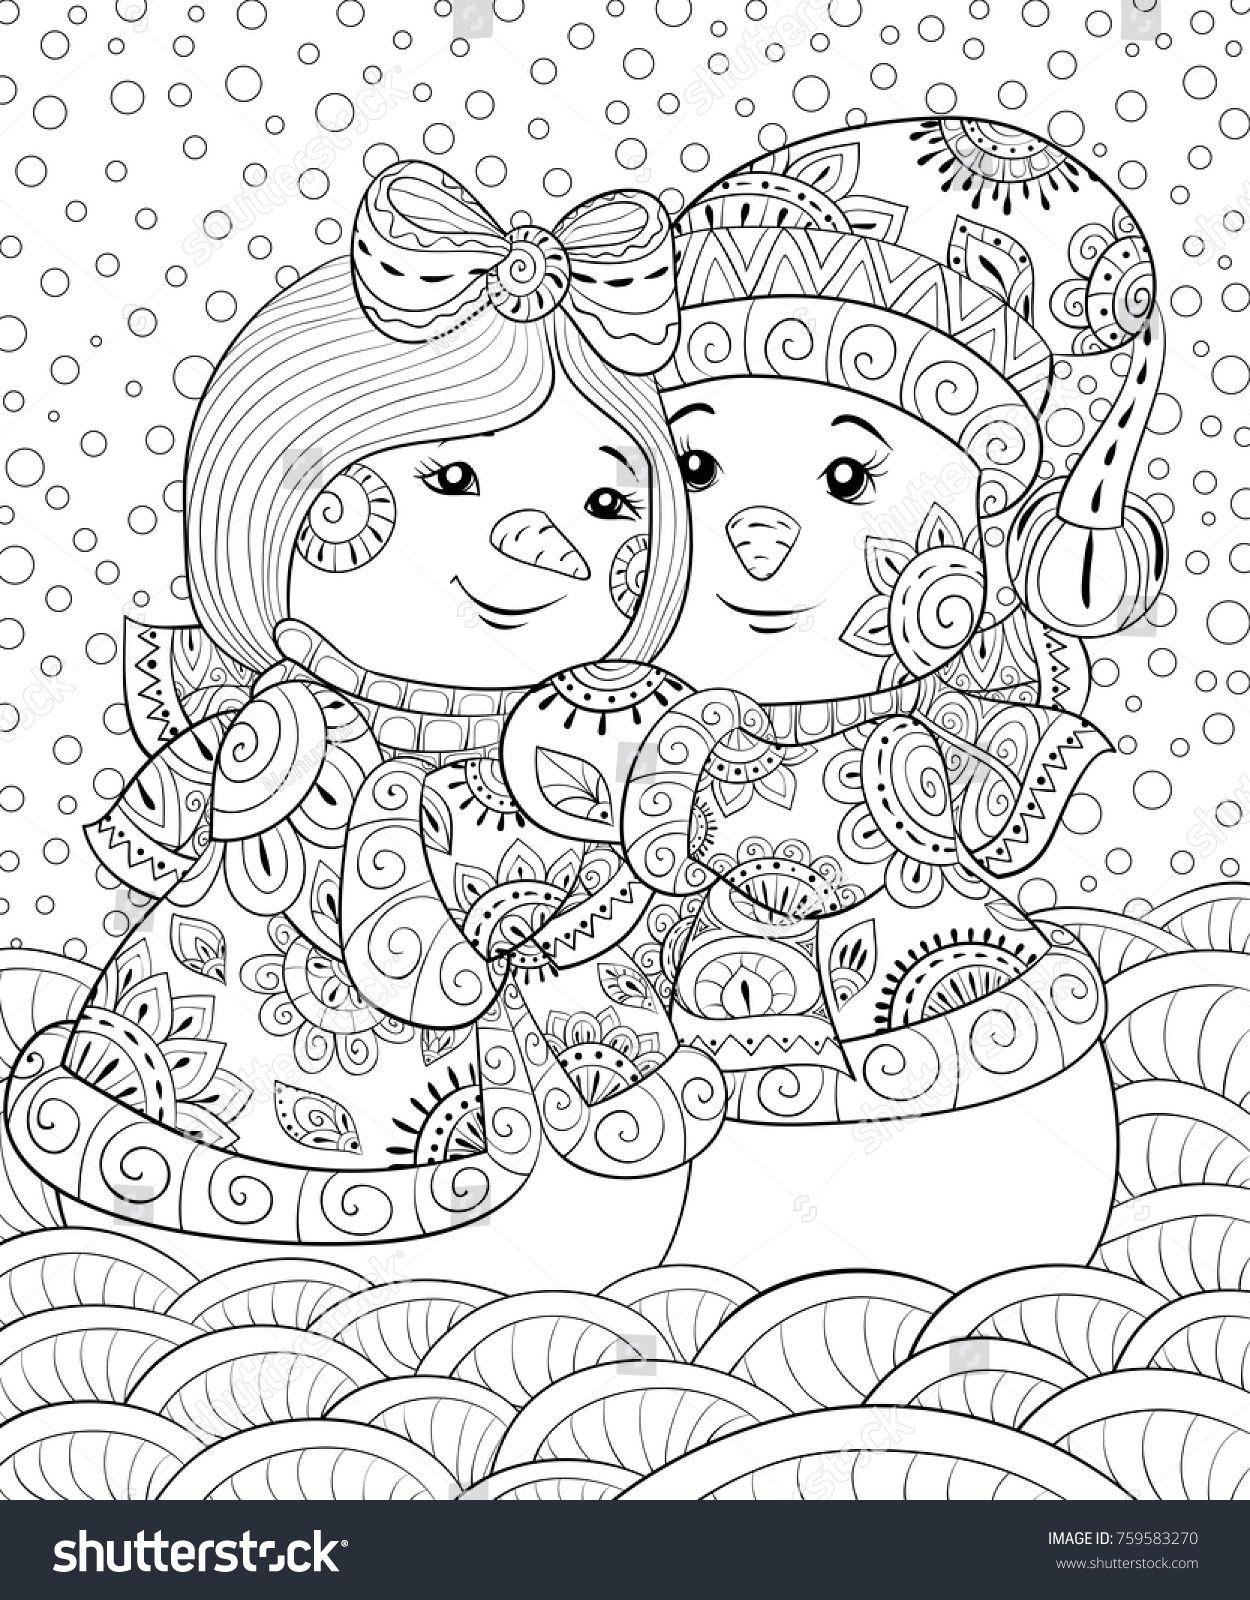 Snowman Joy To The World Digital Download Christmas Coloring Etsy Christmas Coloring Sheets Snowman Coloring Pages Christmas Coloring Pages